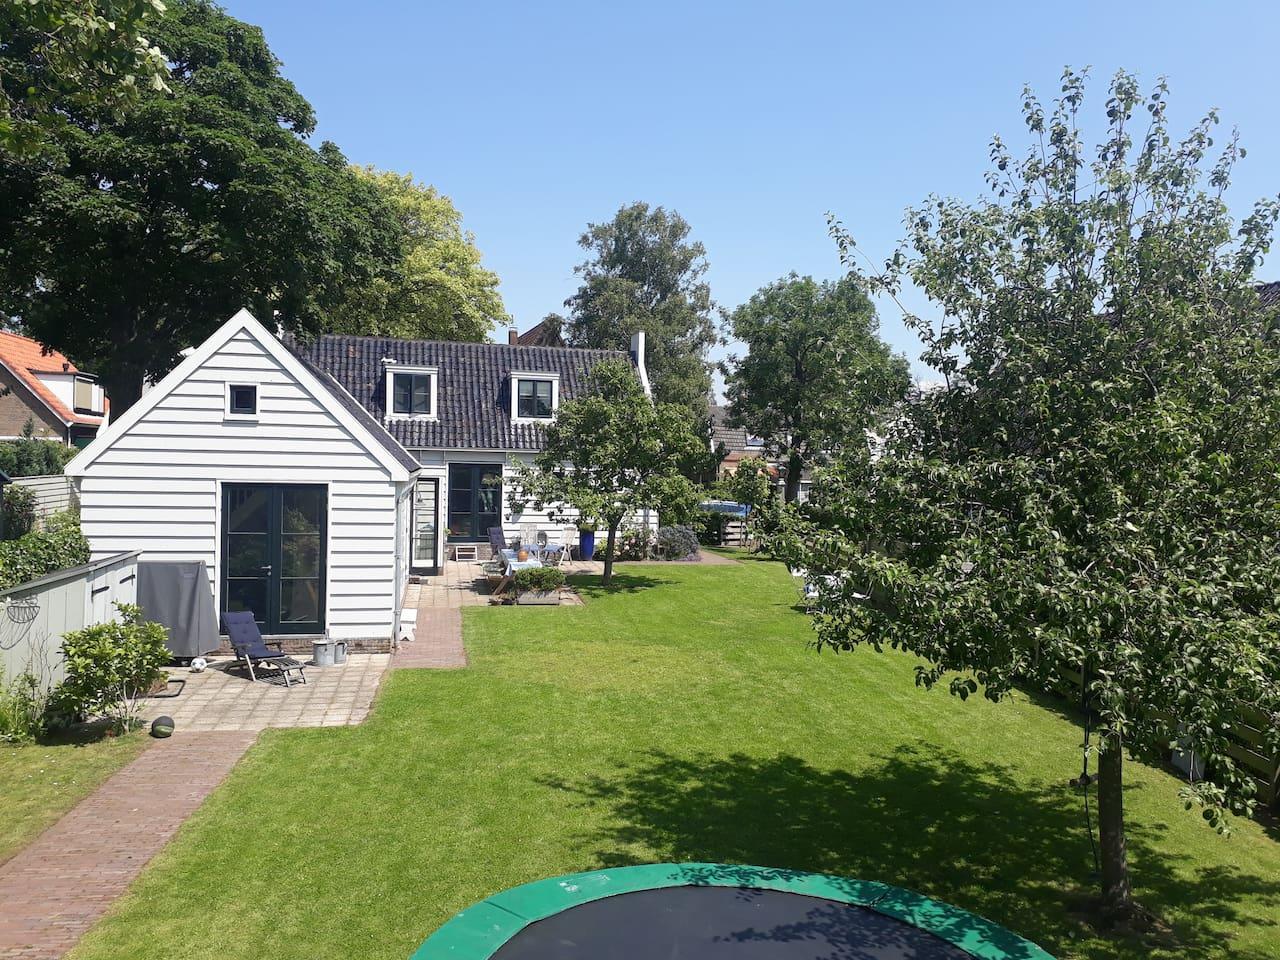 Wooden family house with spacious garden